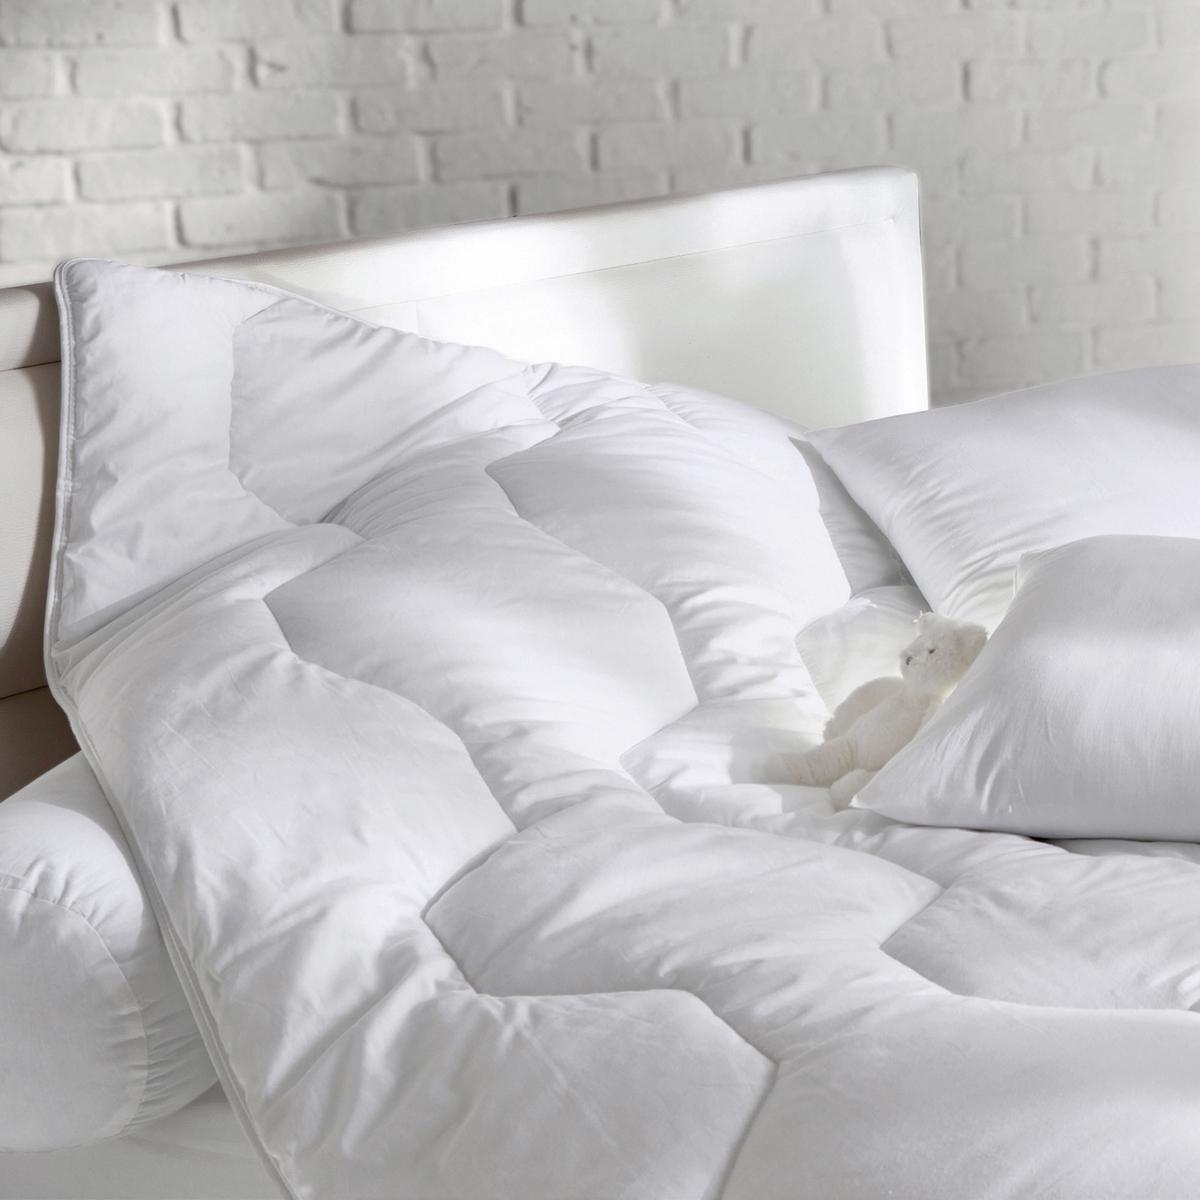 цена Одеяло La Redoute Синтетическое гм с обработкой Santol 240 x 220 см белый онлайн в 2017 году